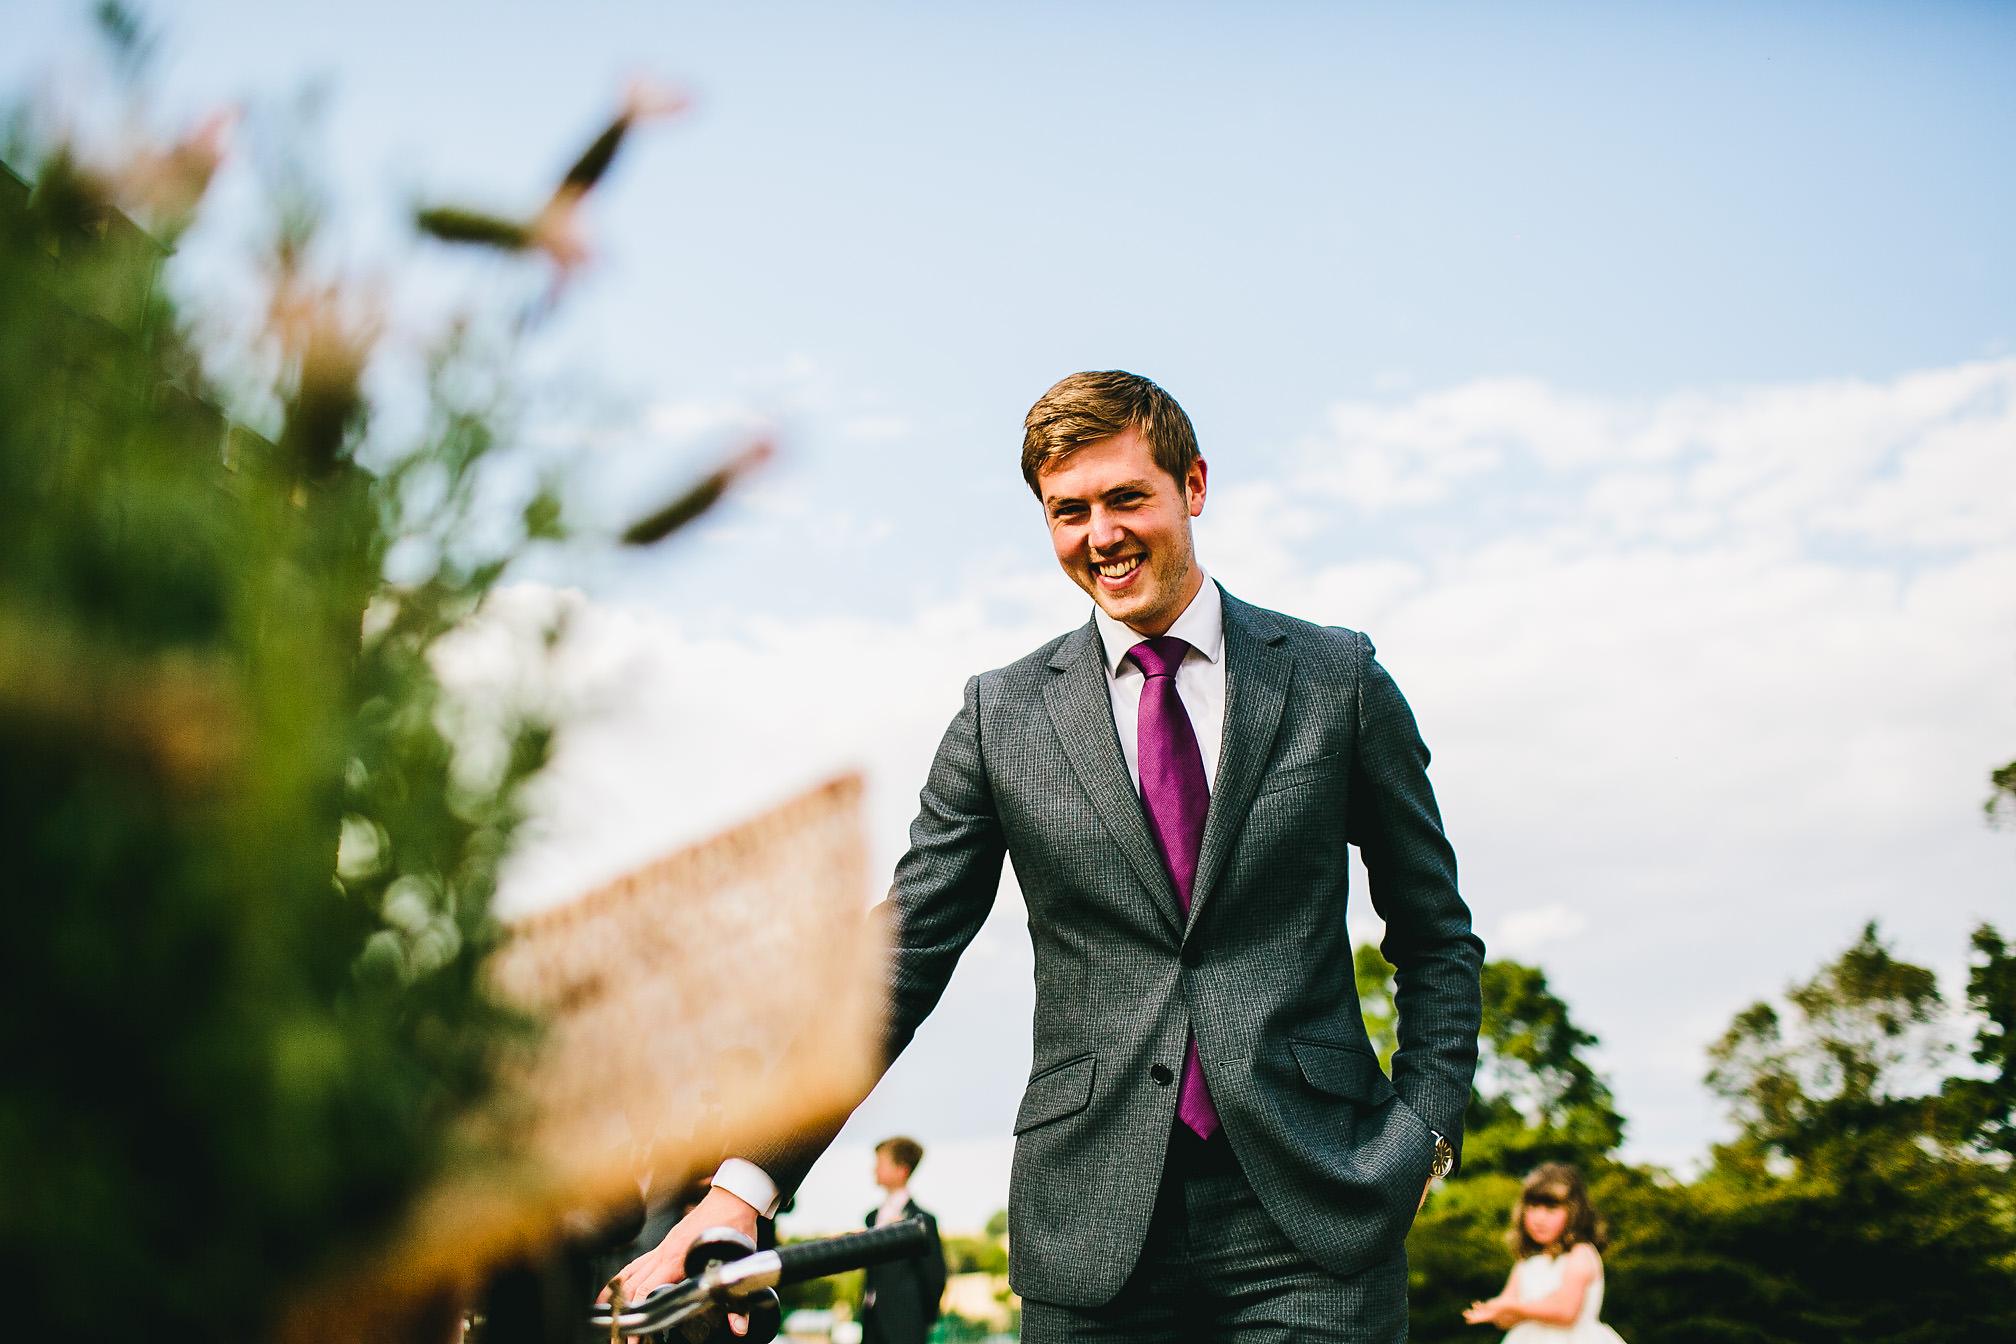 Wedding guest holding tandem biike